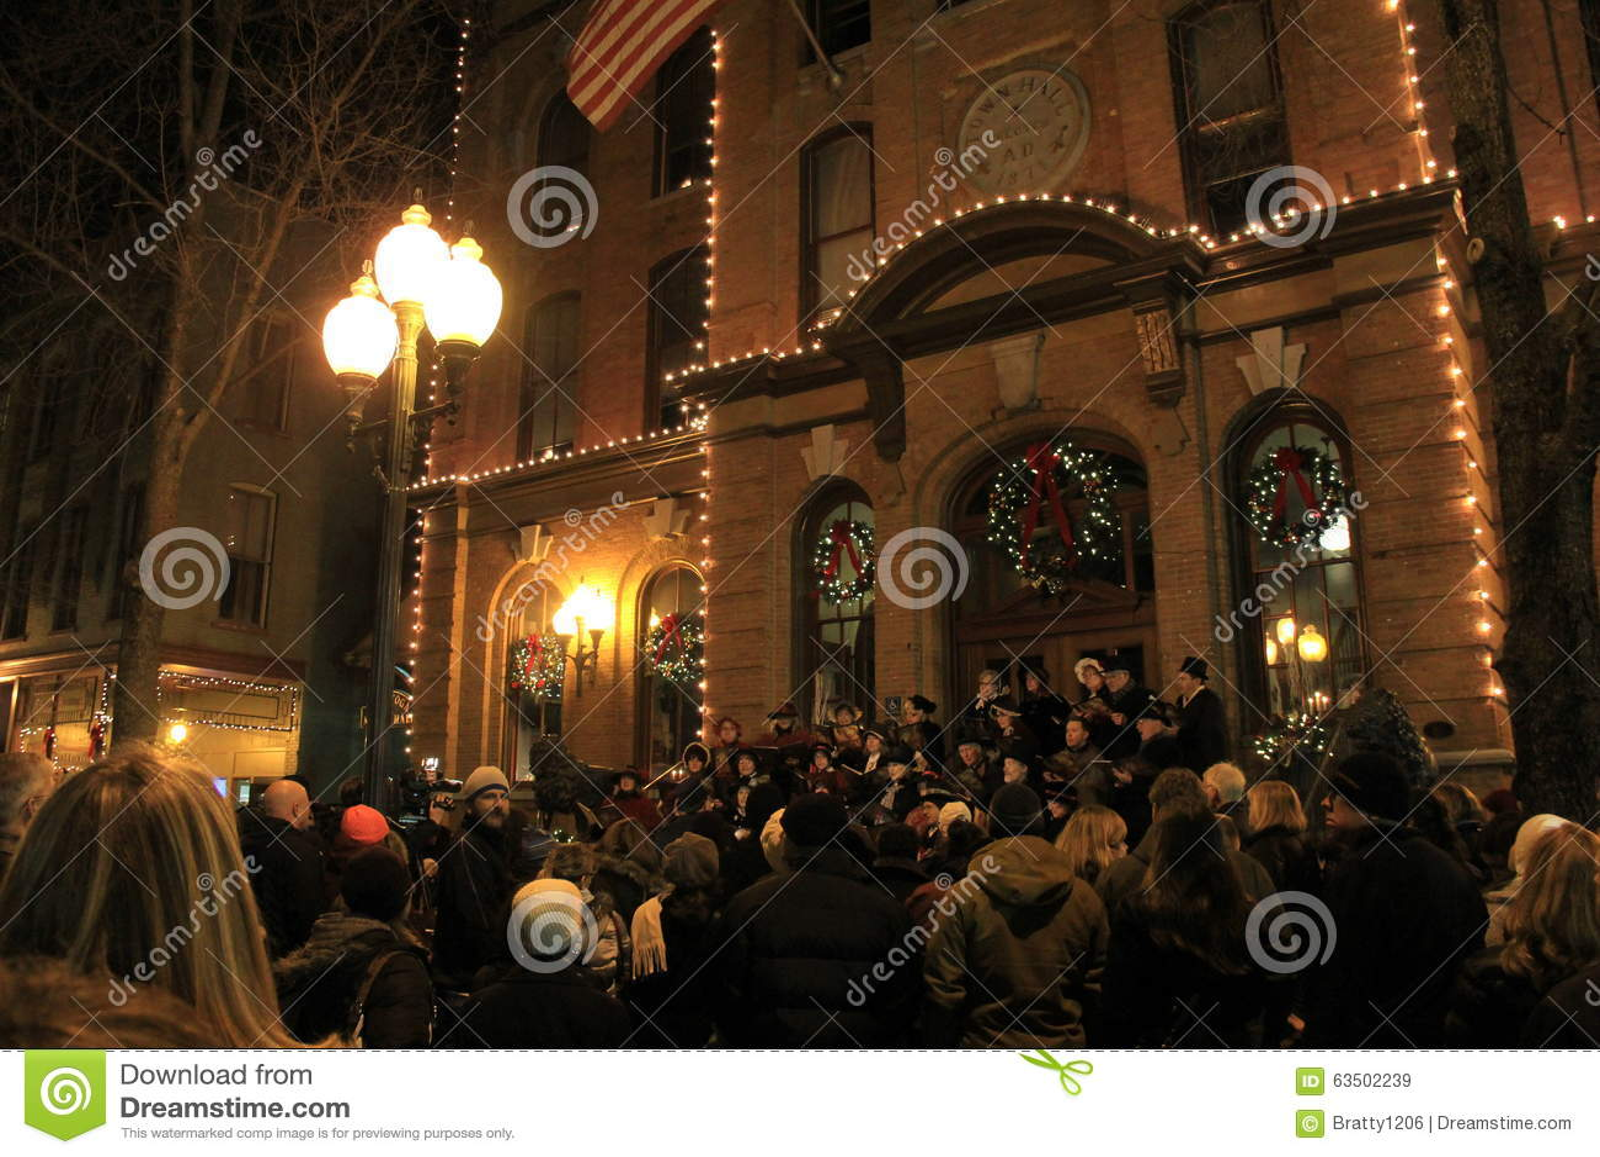 Carolers and bystanders enjoying the night, Victorian Street Walk,Saratoga,New York,2015